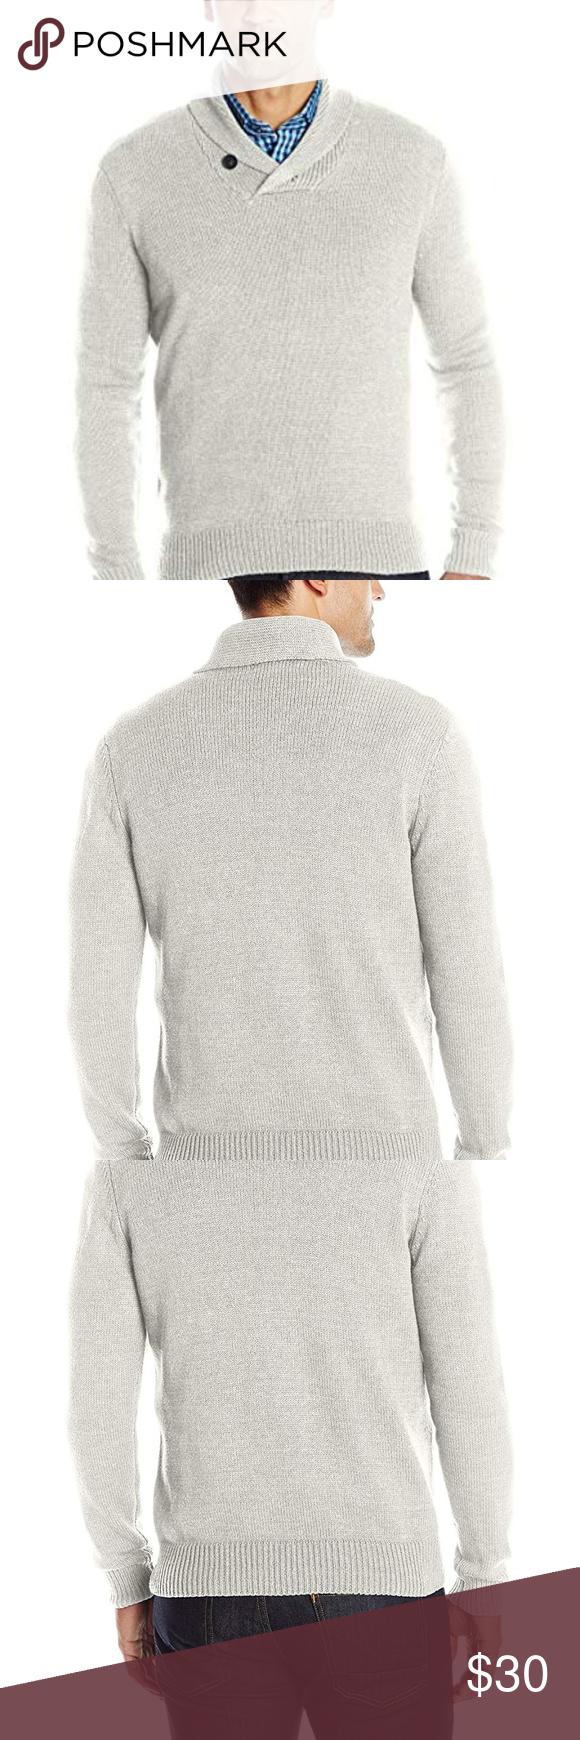 NWT Axist Men s Long Sleeve Shawl Collar Sweater 5c02dcbd0